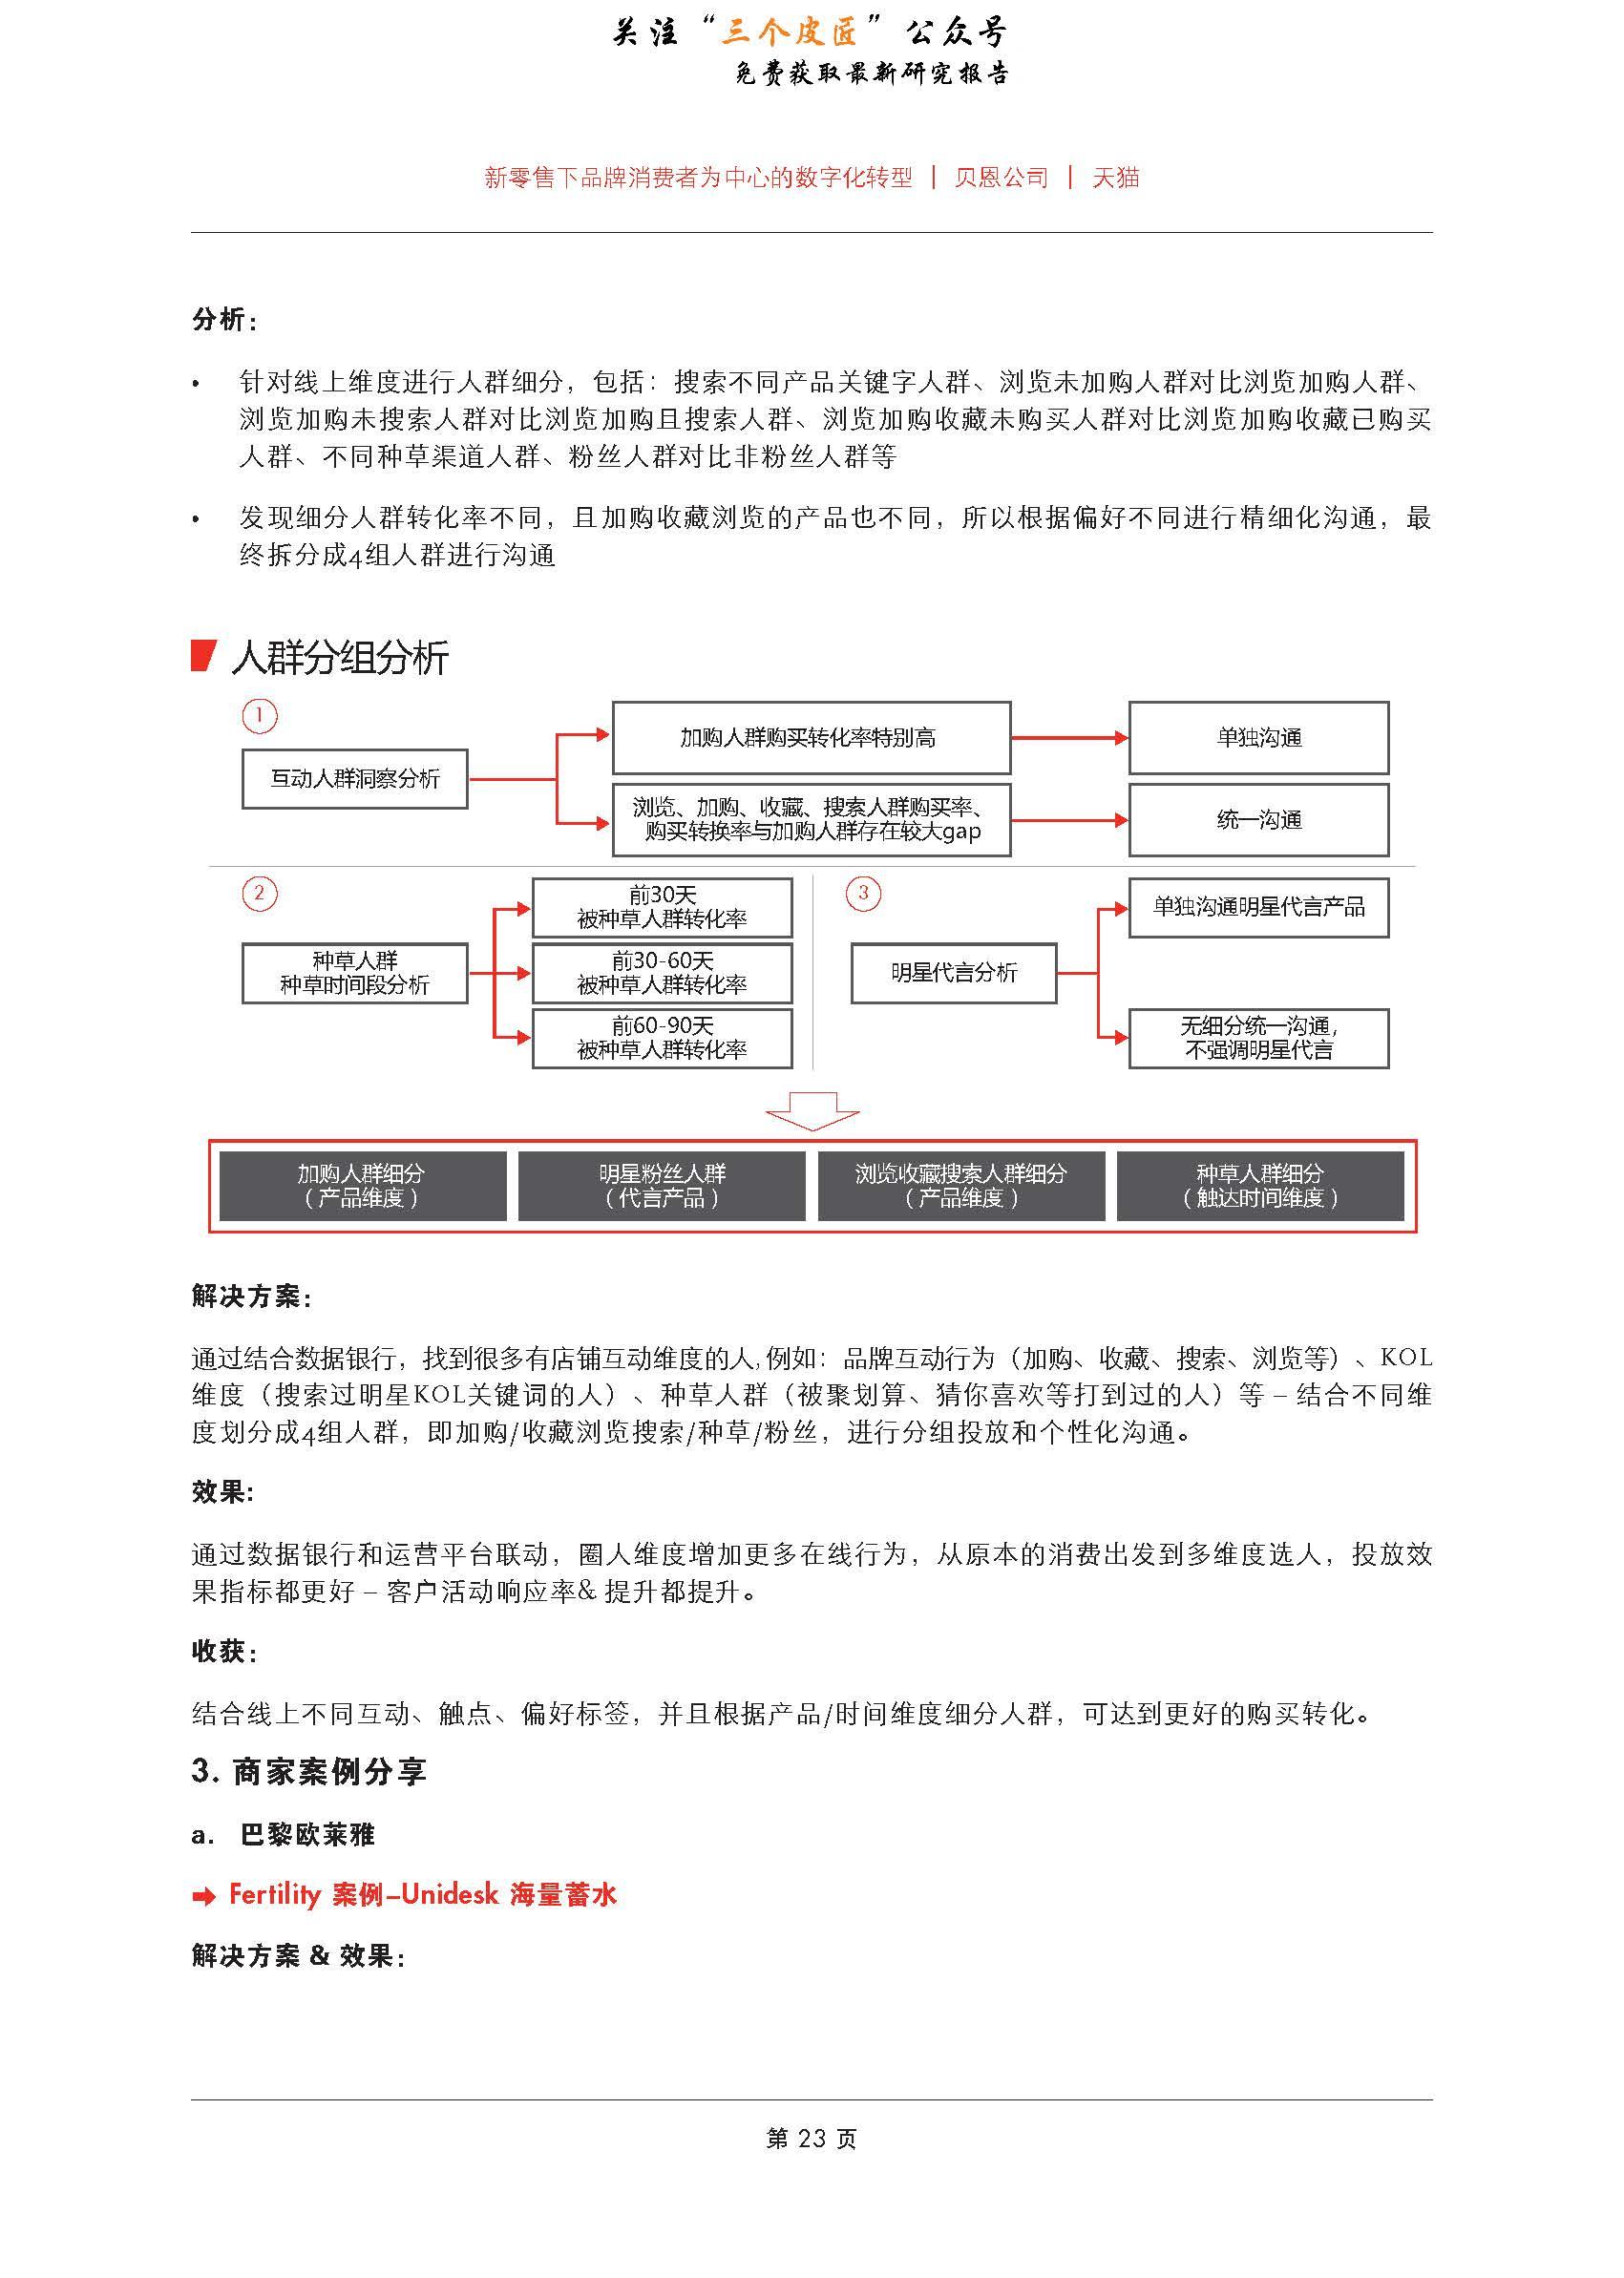 1_Page_25.jpg